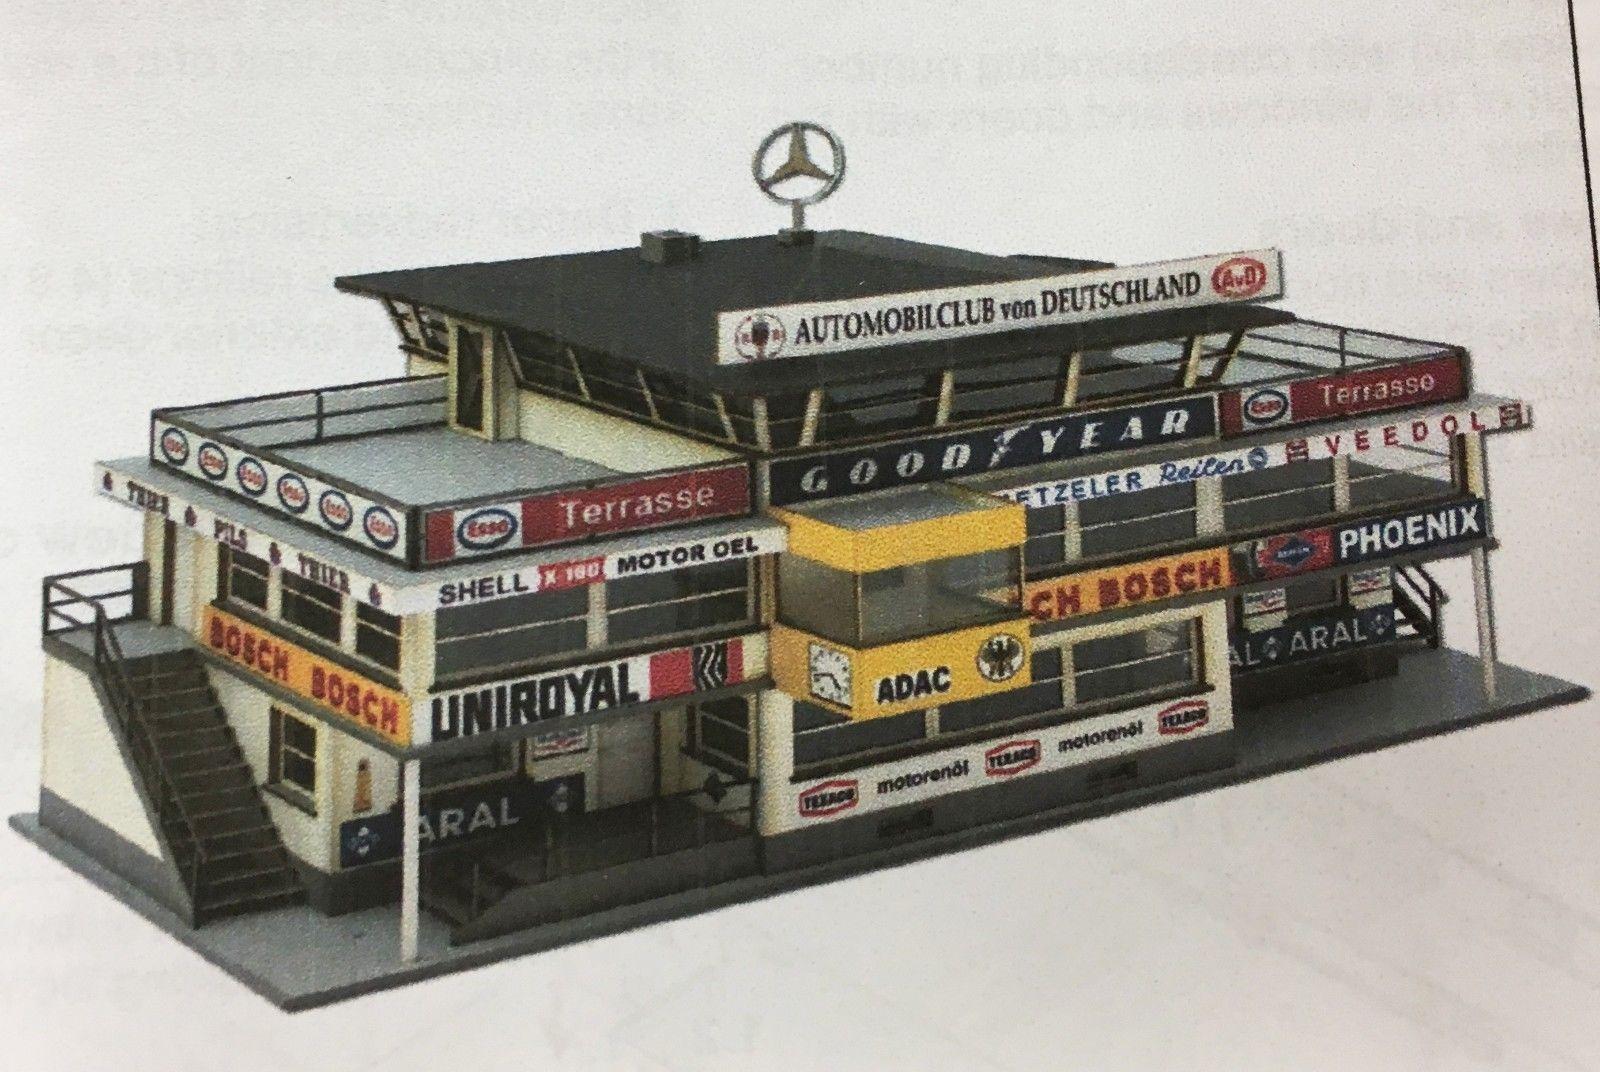 Car Toys Aurora Co: START FINISH BUILDING NURBURGRING 1960S HO SLOT CAR